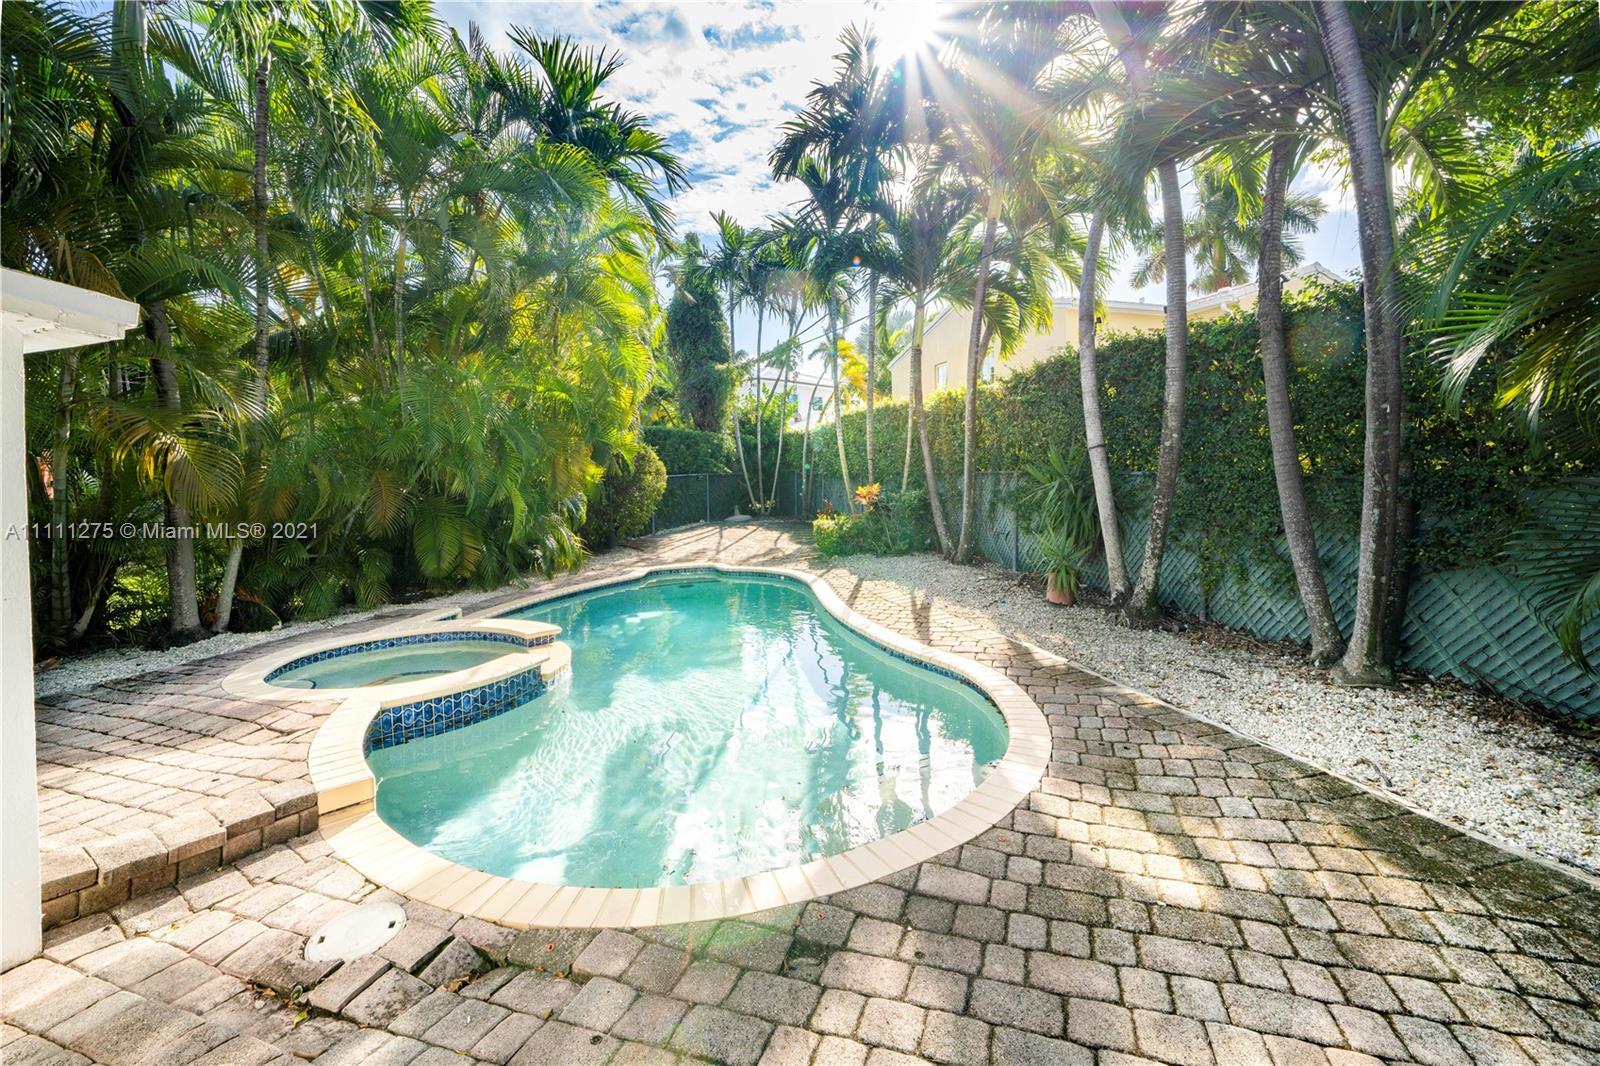 La Gorce Golf - 6211 Alton Rd, Miami Beach, FL 33140